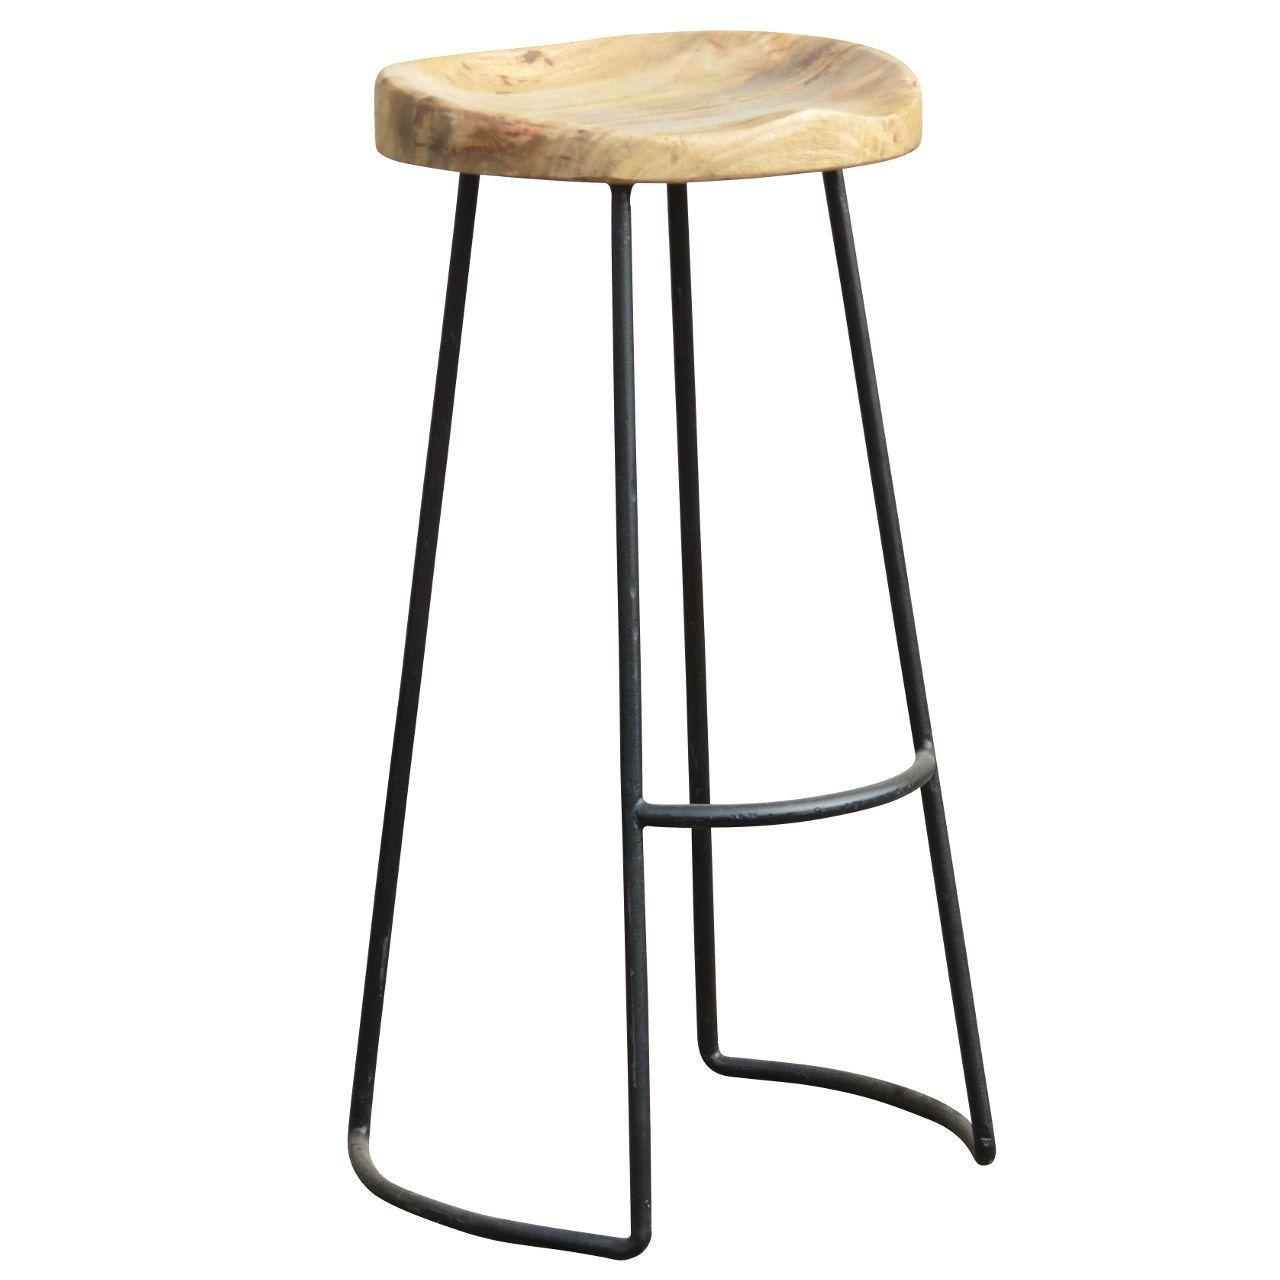 Curve Seat Barstool   The Industrial Range   Bar stools, Stool ...